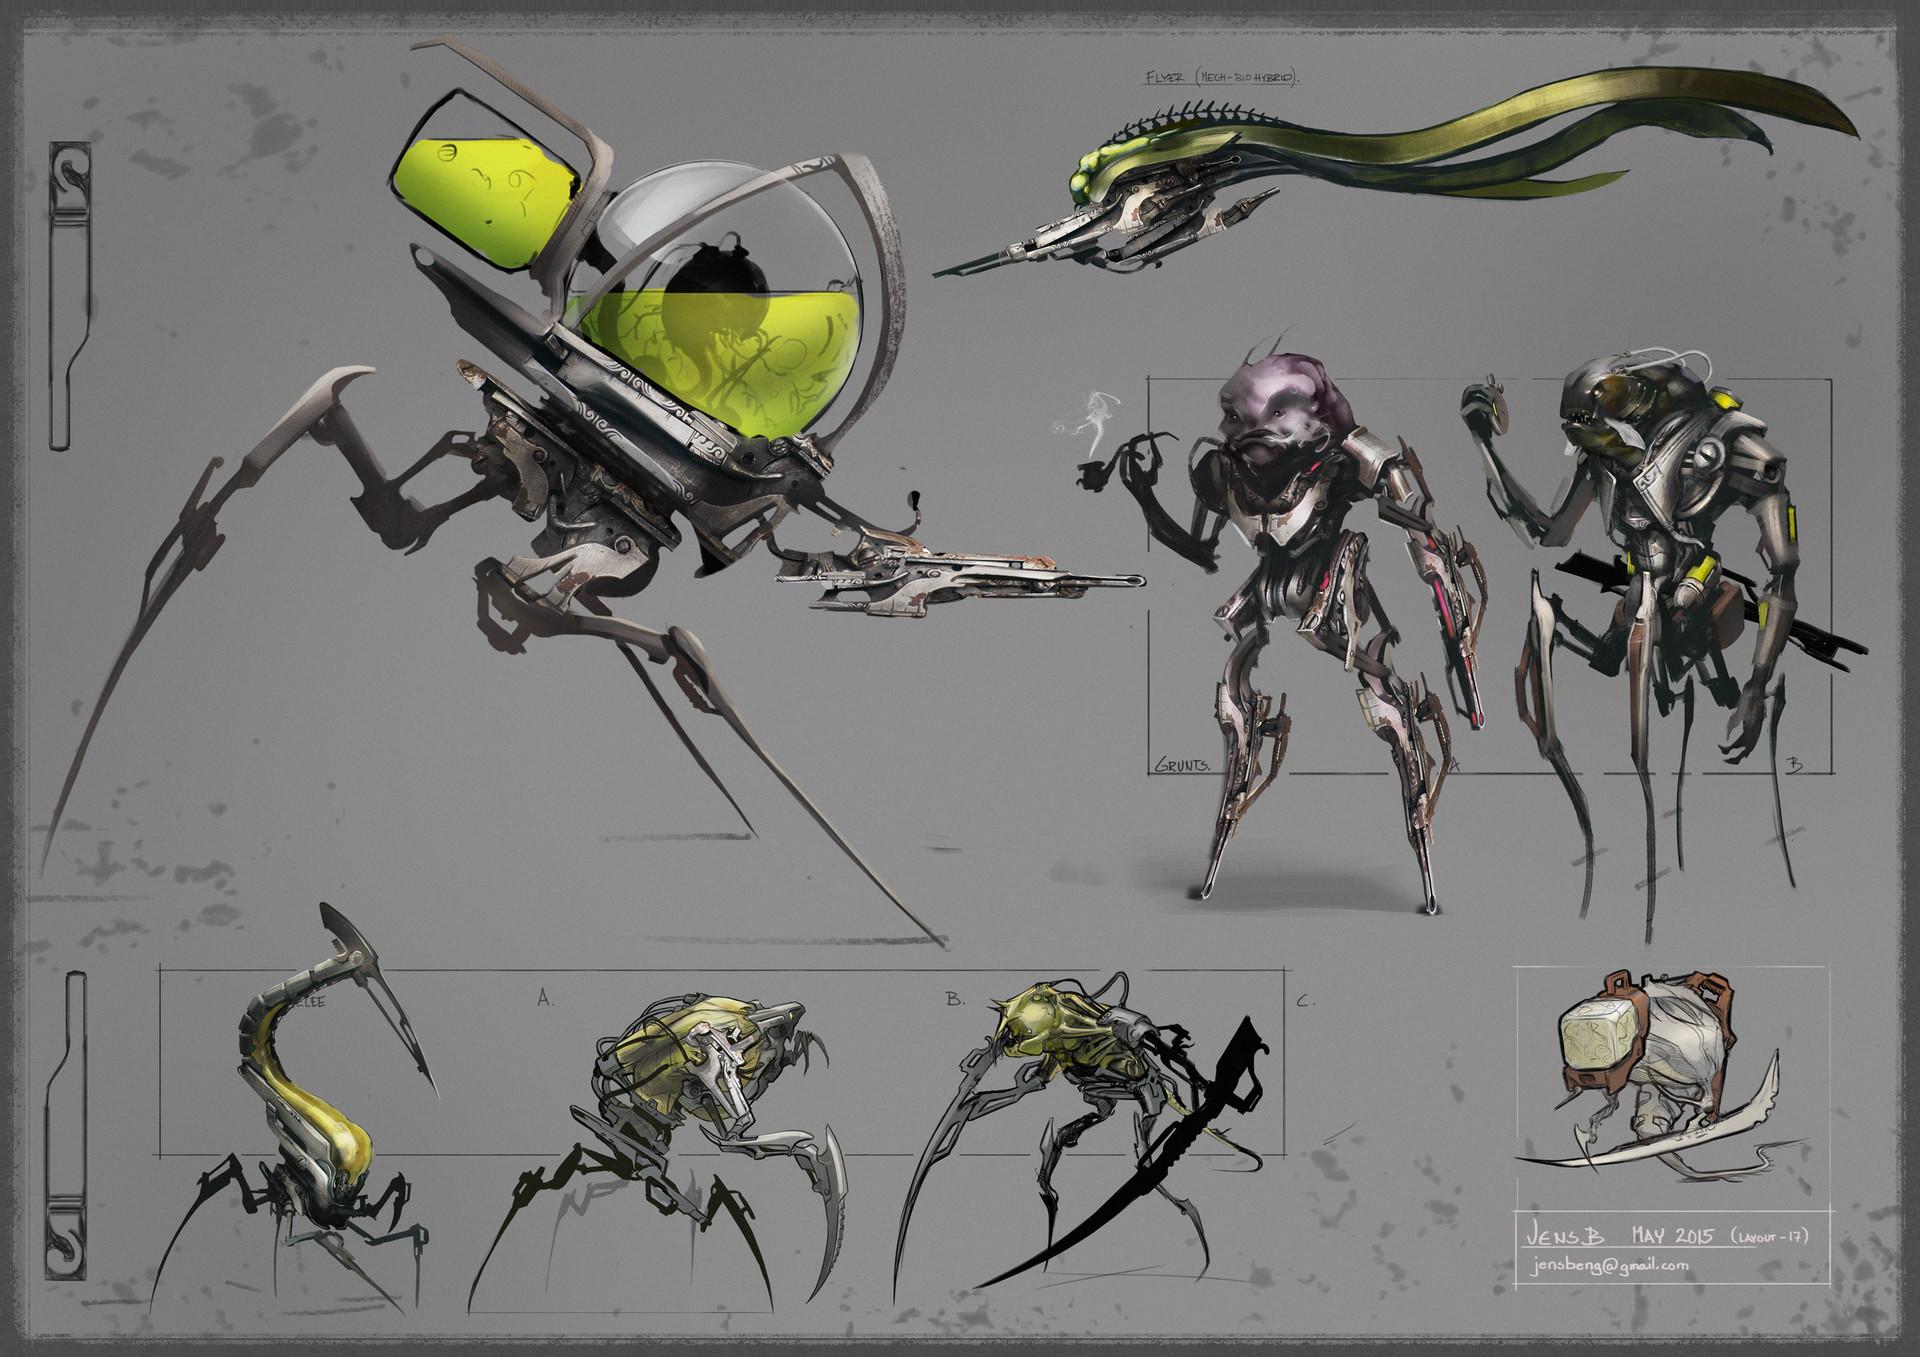 Jens bengtsson alientechenemies